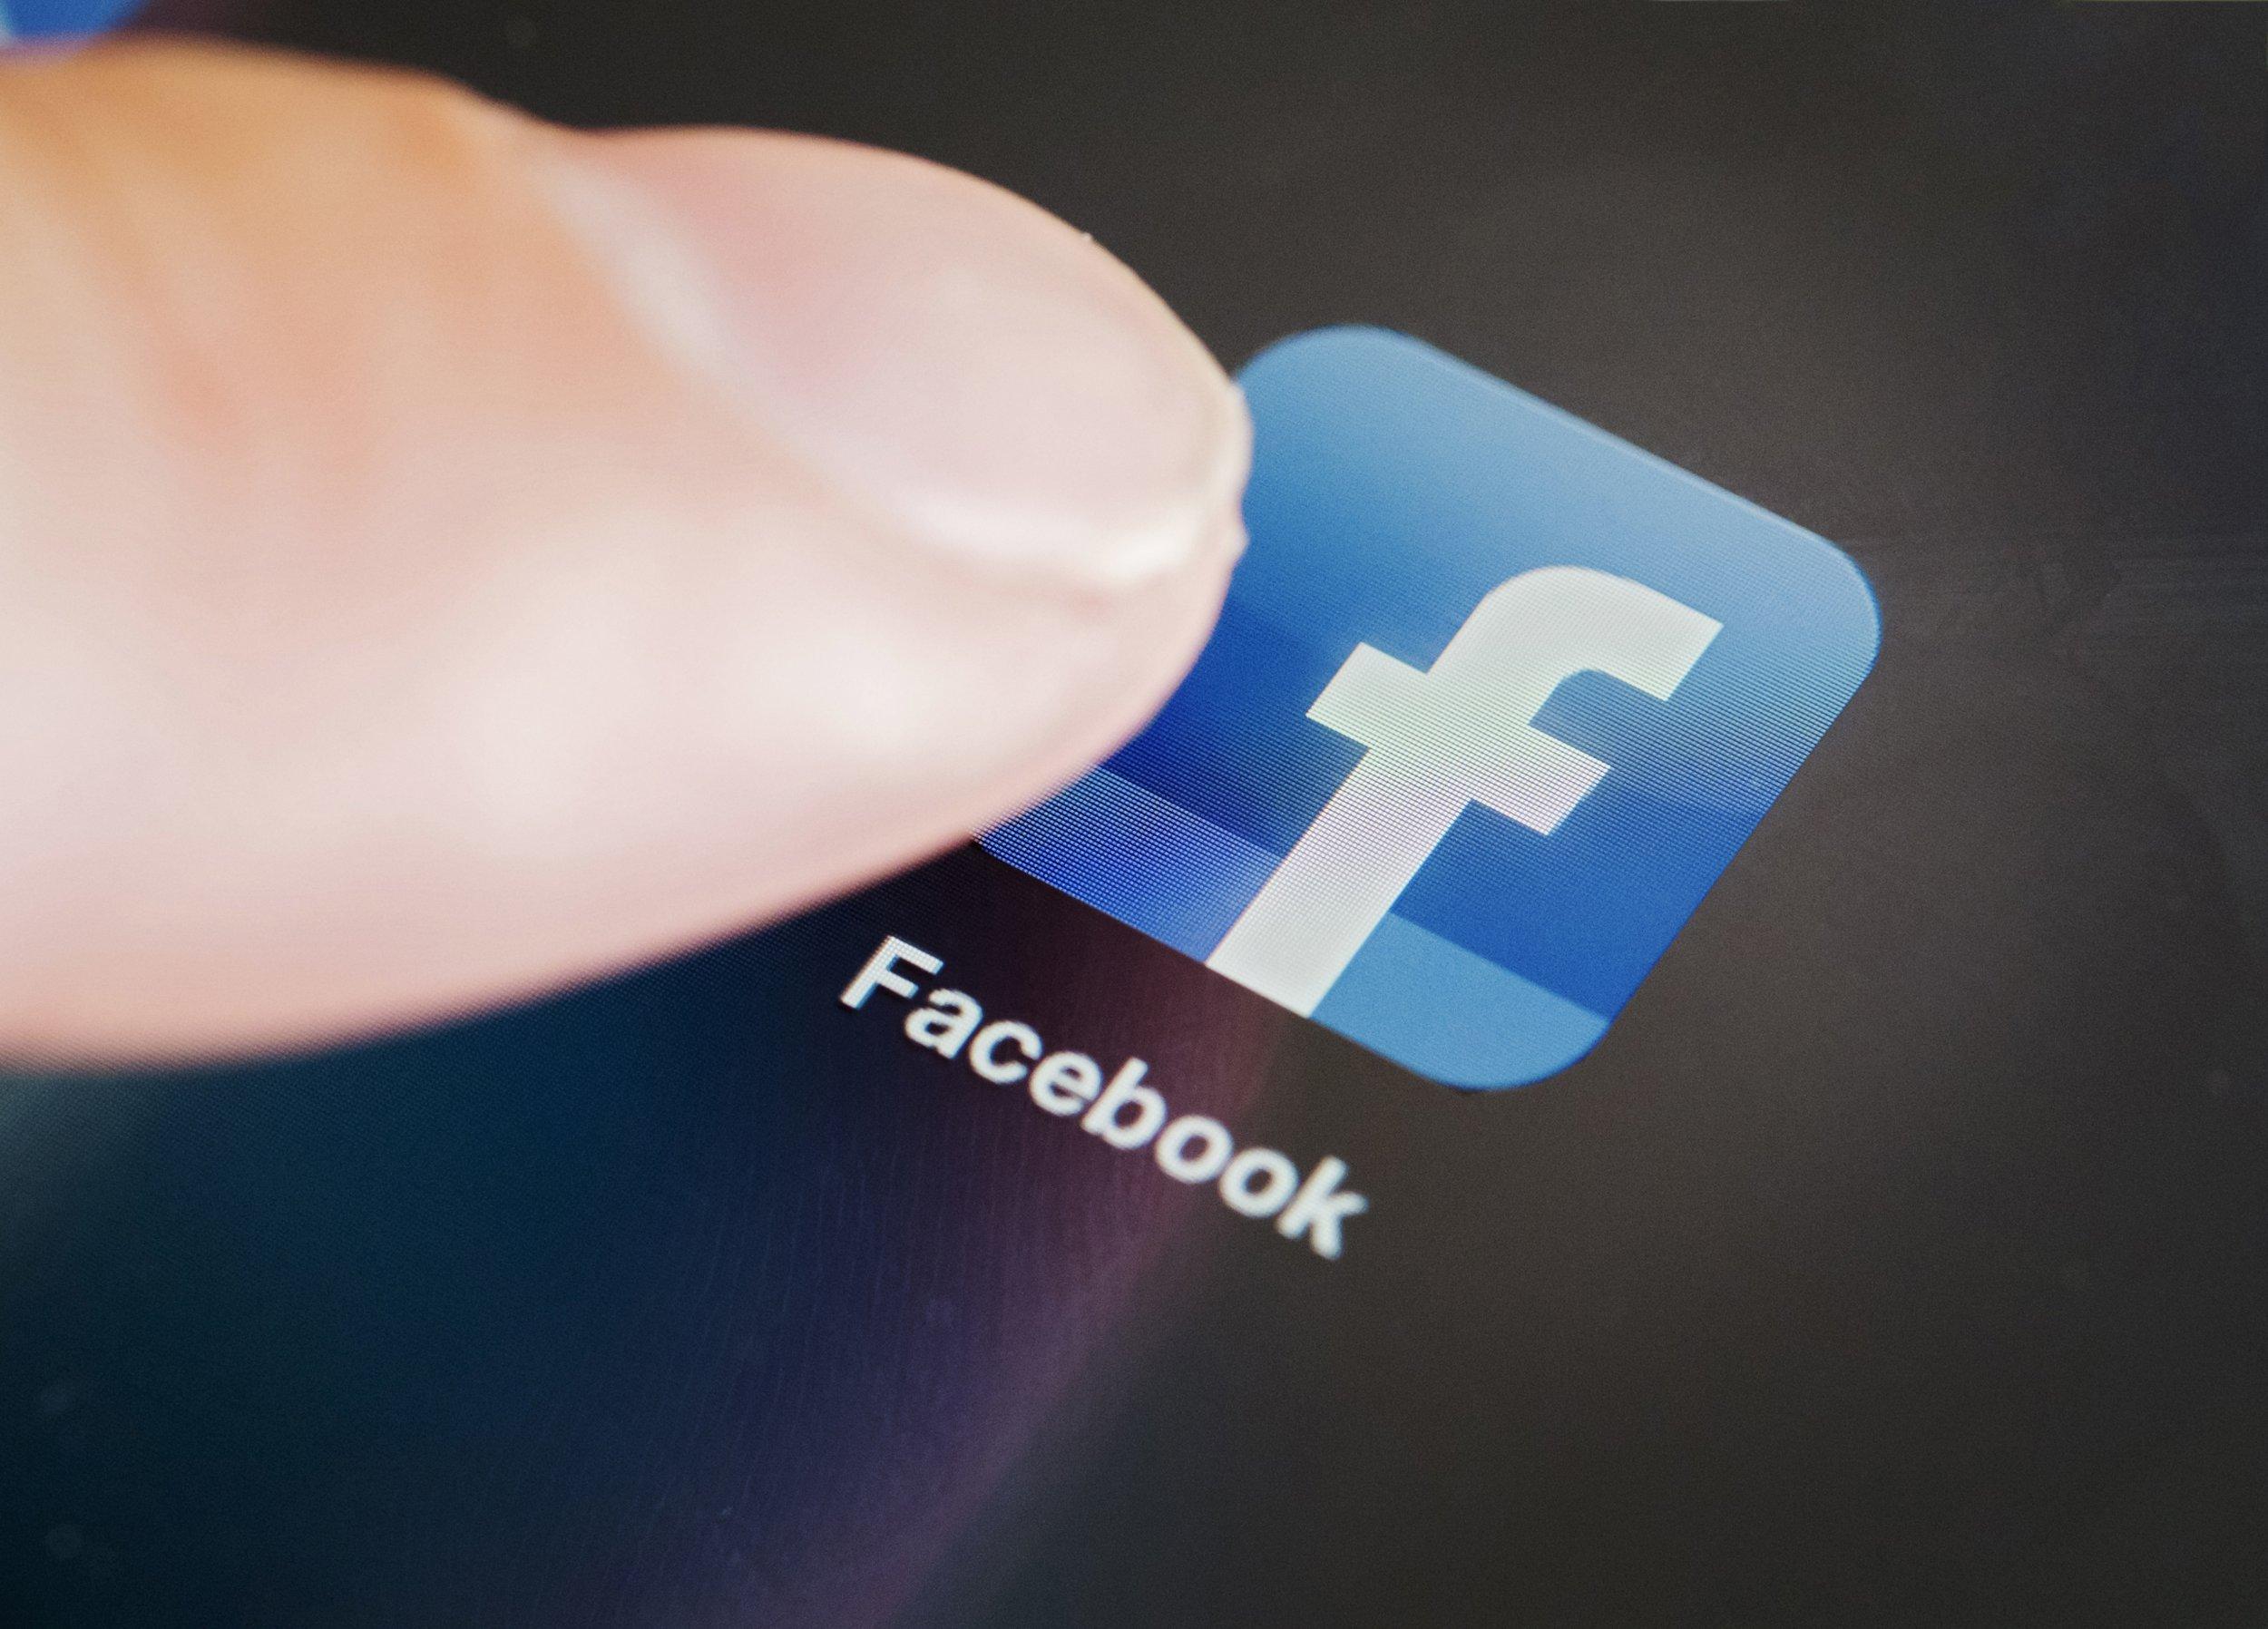 Detail of Facebook social media app icon on iPad tablet computer screen